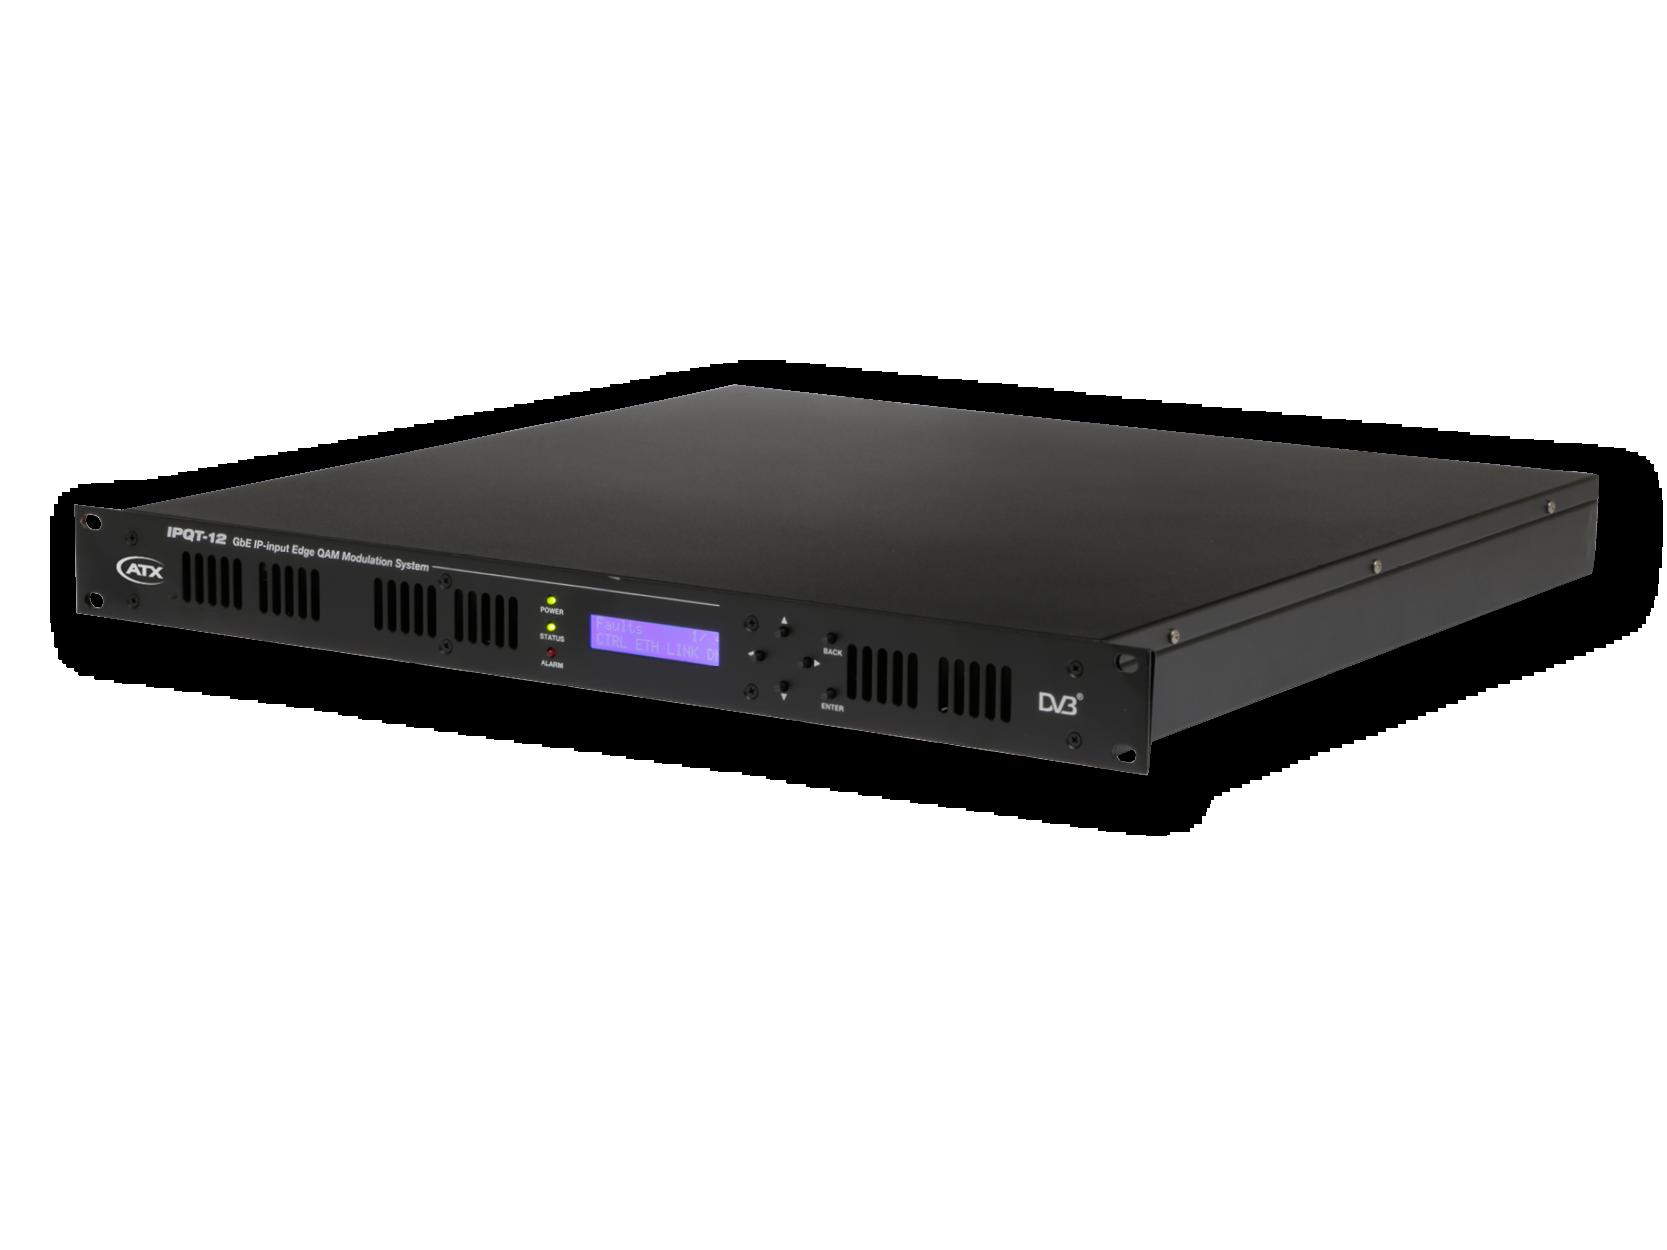 IPQT-12: GbE IP-input EdgeQAM Modulation System